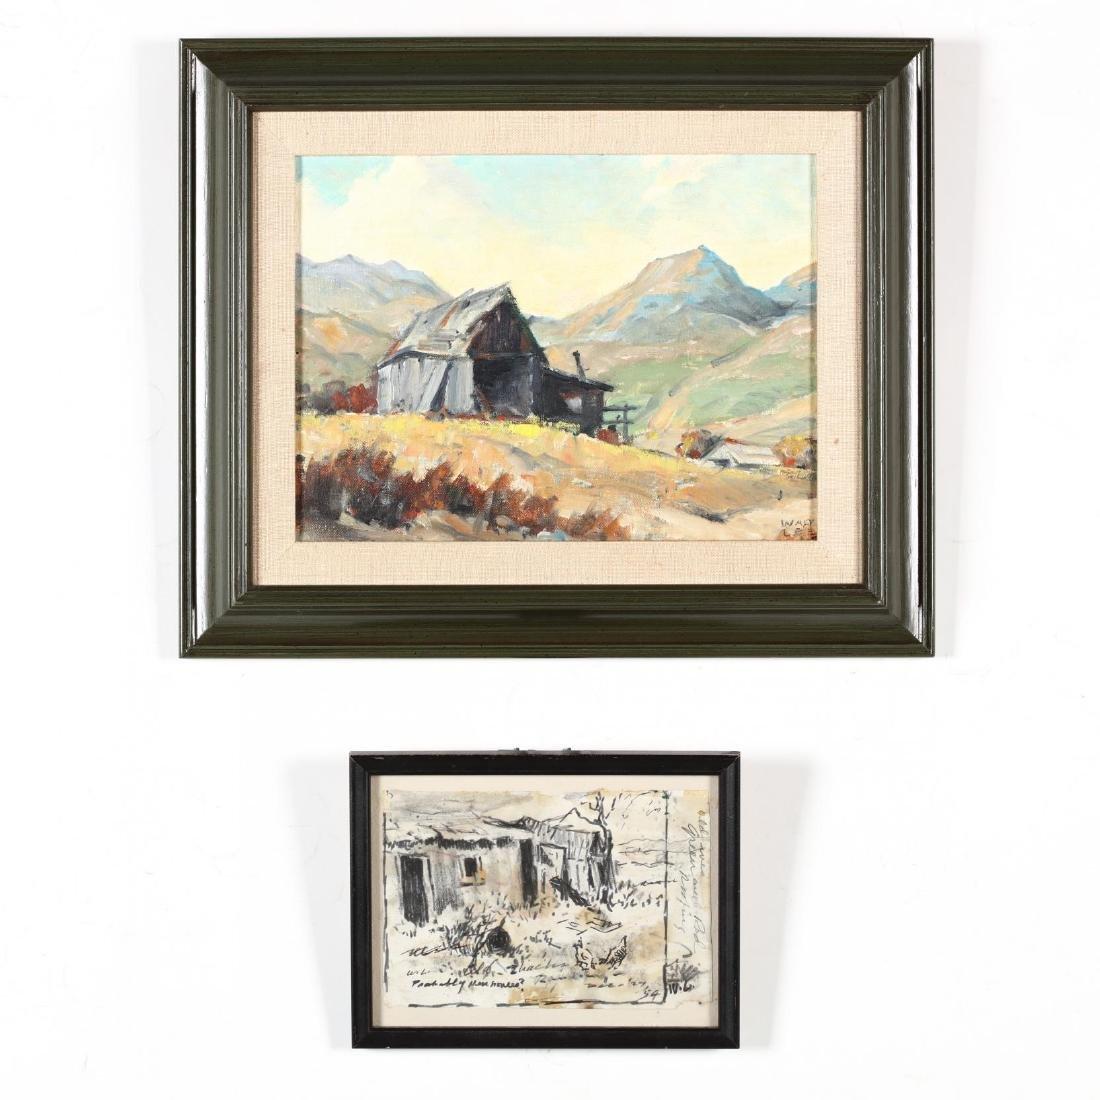 Walt Lee (California, 1888-1980), Two Works